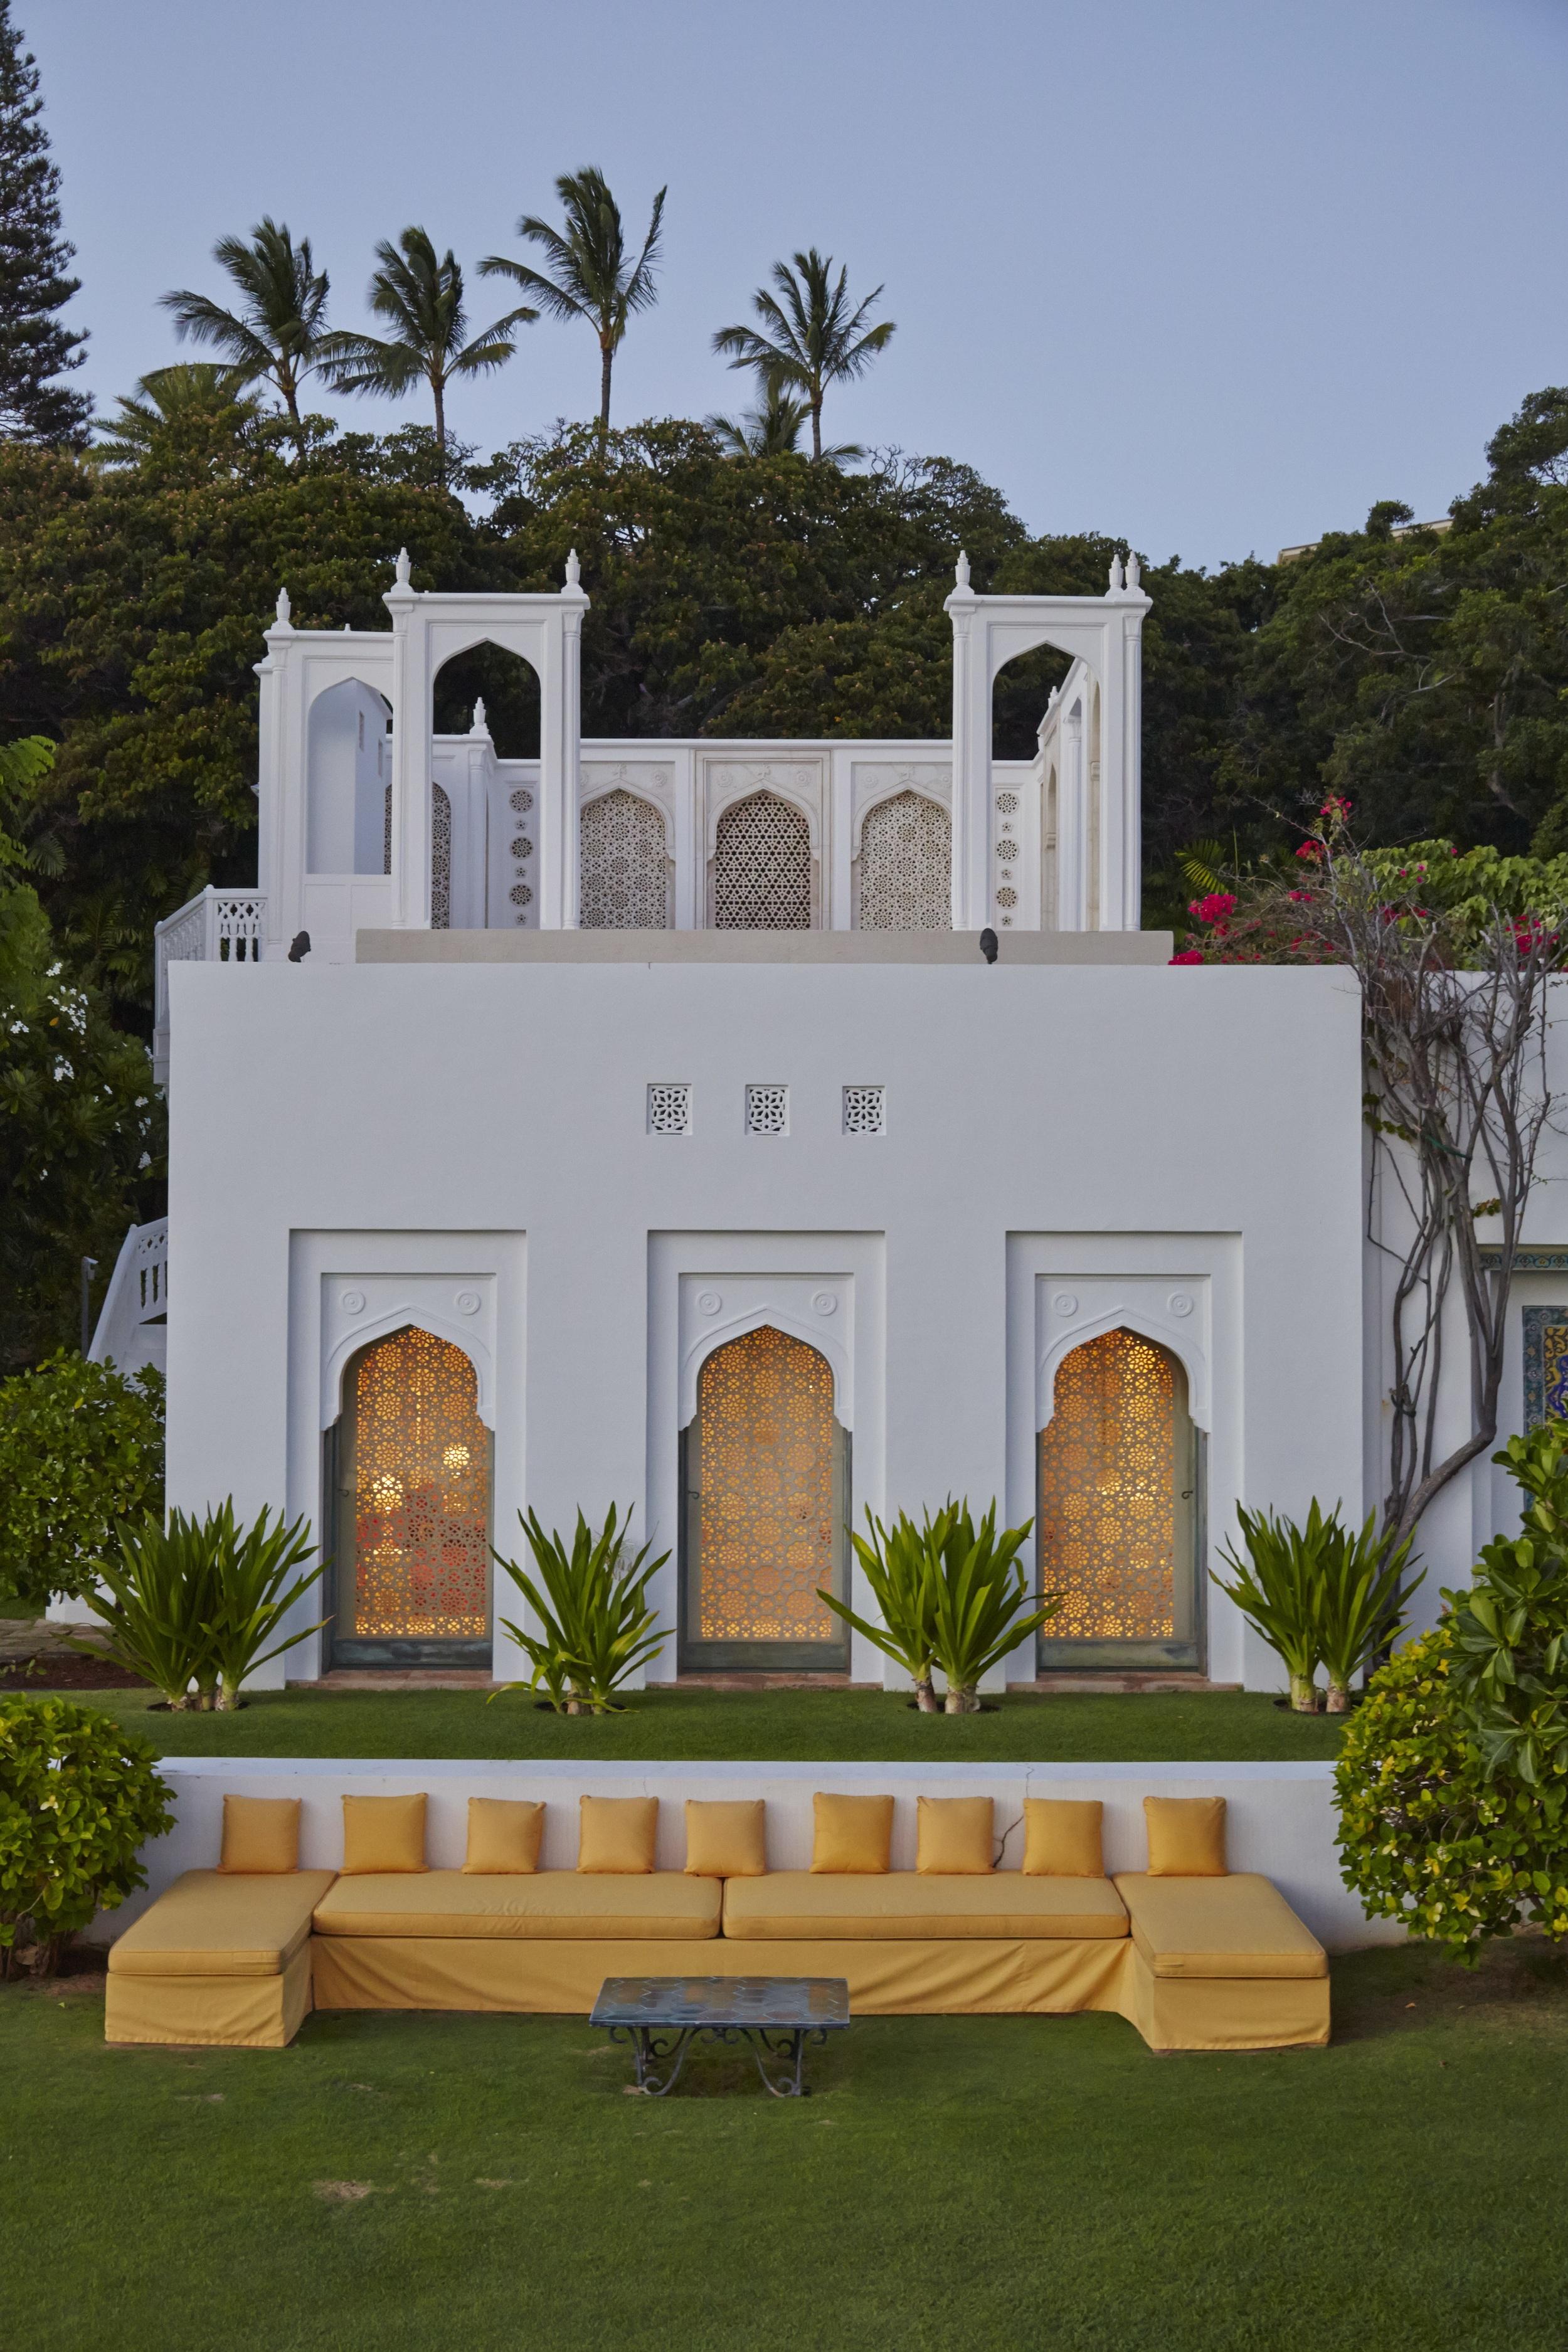 Exterior of the Mughal Suite at Shangri La. © 2014, Linny Morris, courtesy of the Doris Duke Foundation for Islamic Art, Honolulu, Hawai'i.